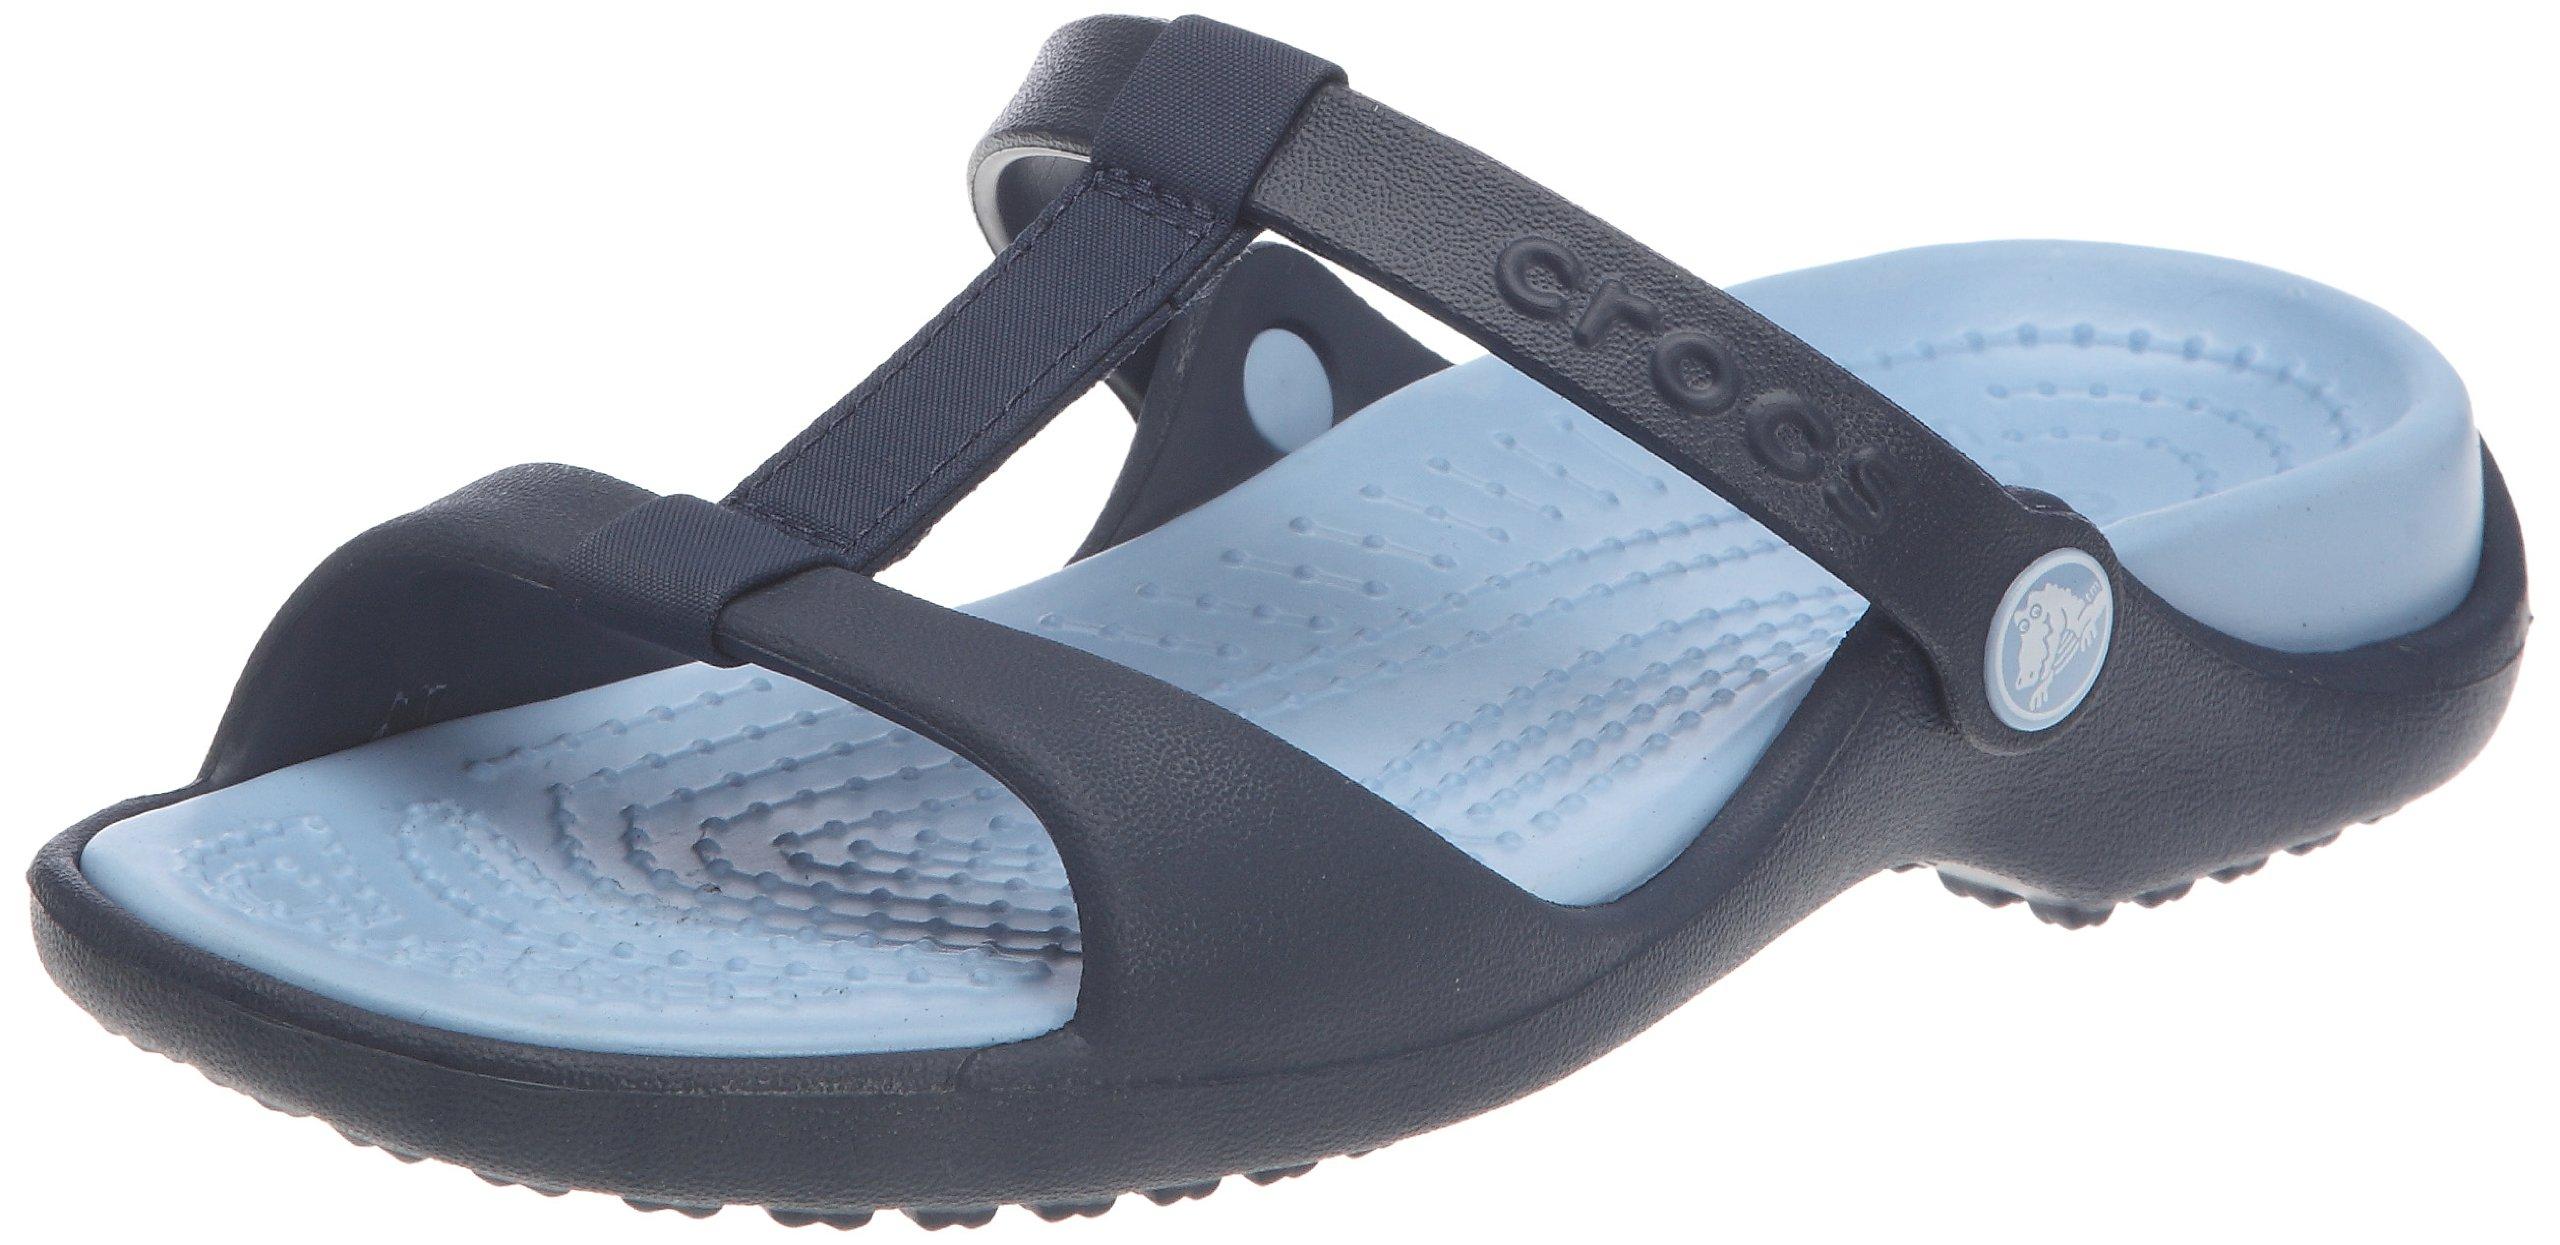 77aedd4fde2c5 Galleon - Crocs Cleo III Ladies Fashion Mules 11216 9 B(M) US Navy Light  Blue